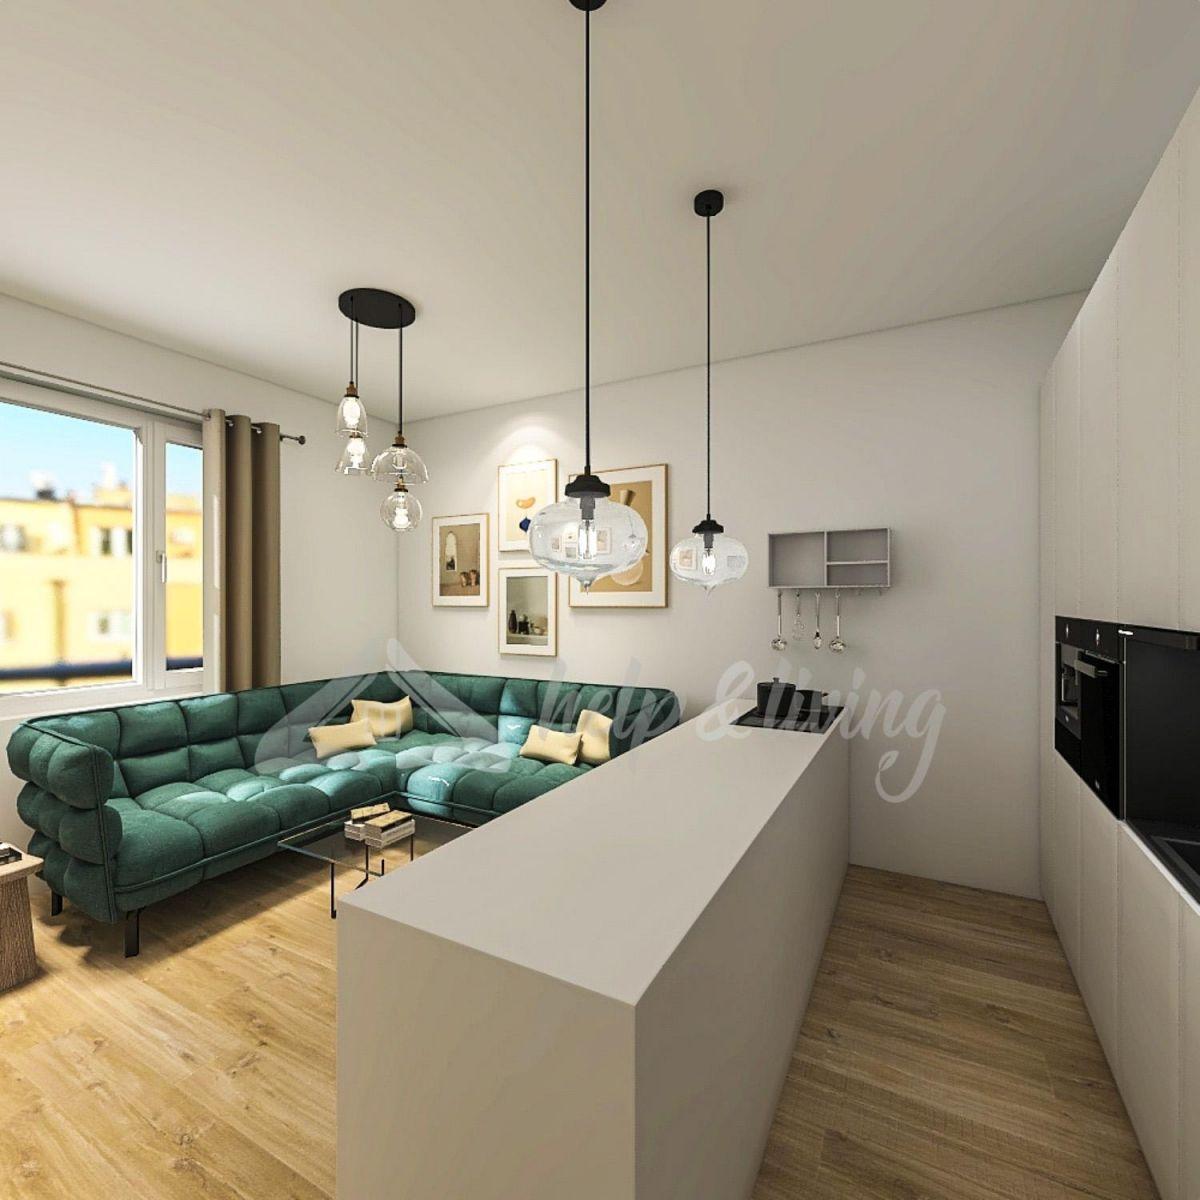 Prodej bytu 2+kk,45m2, ul. Spolupráce, Praha 4 - Nusle